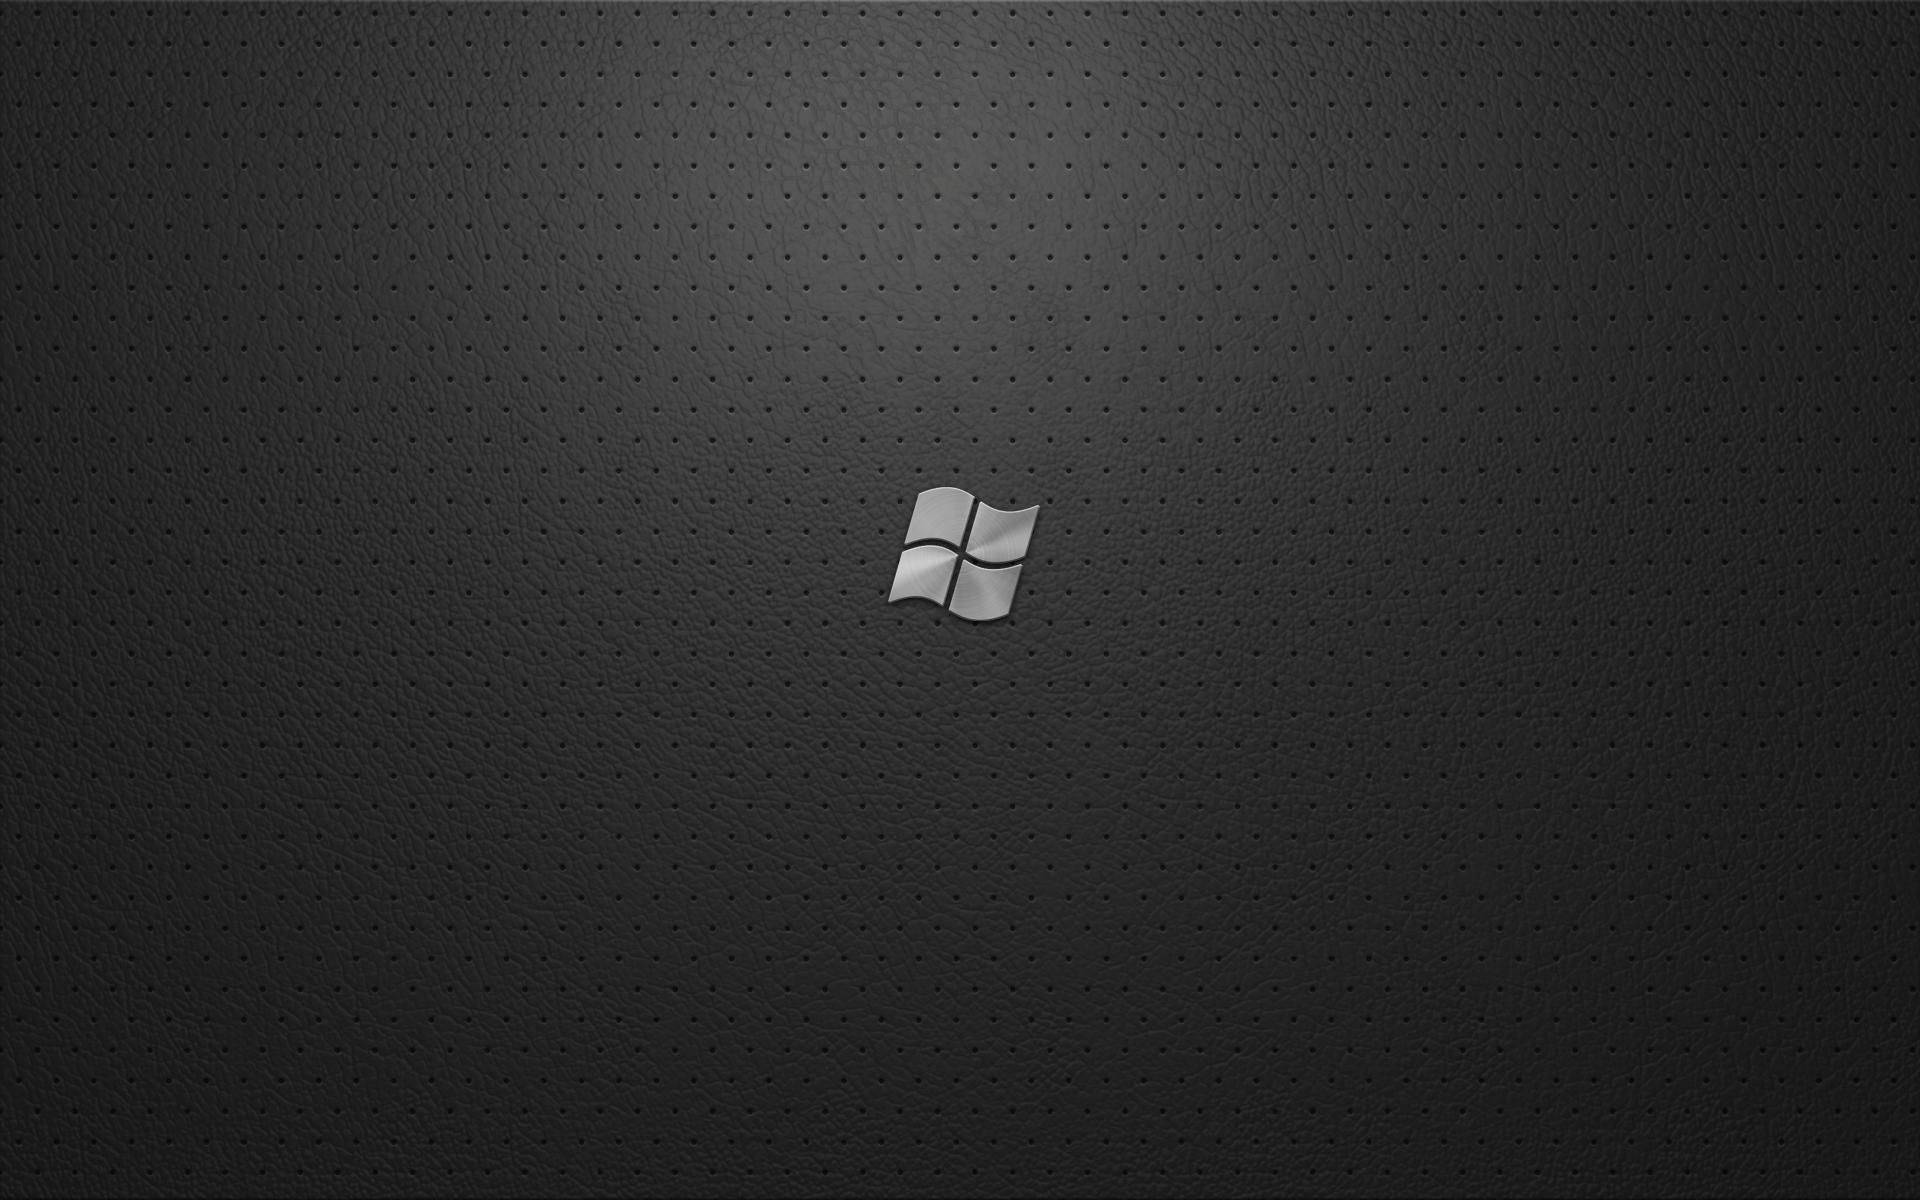 1920x1200 Windows 7 Black High Quality Wallpaper